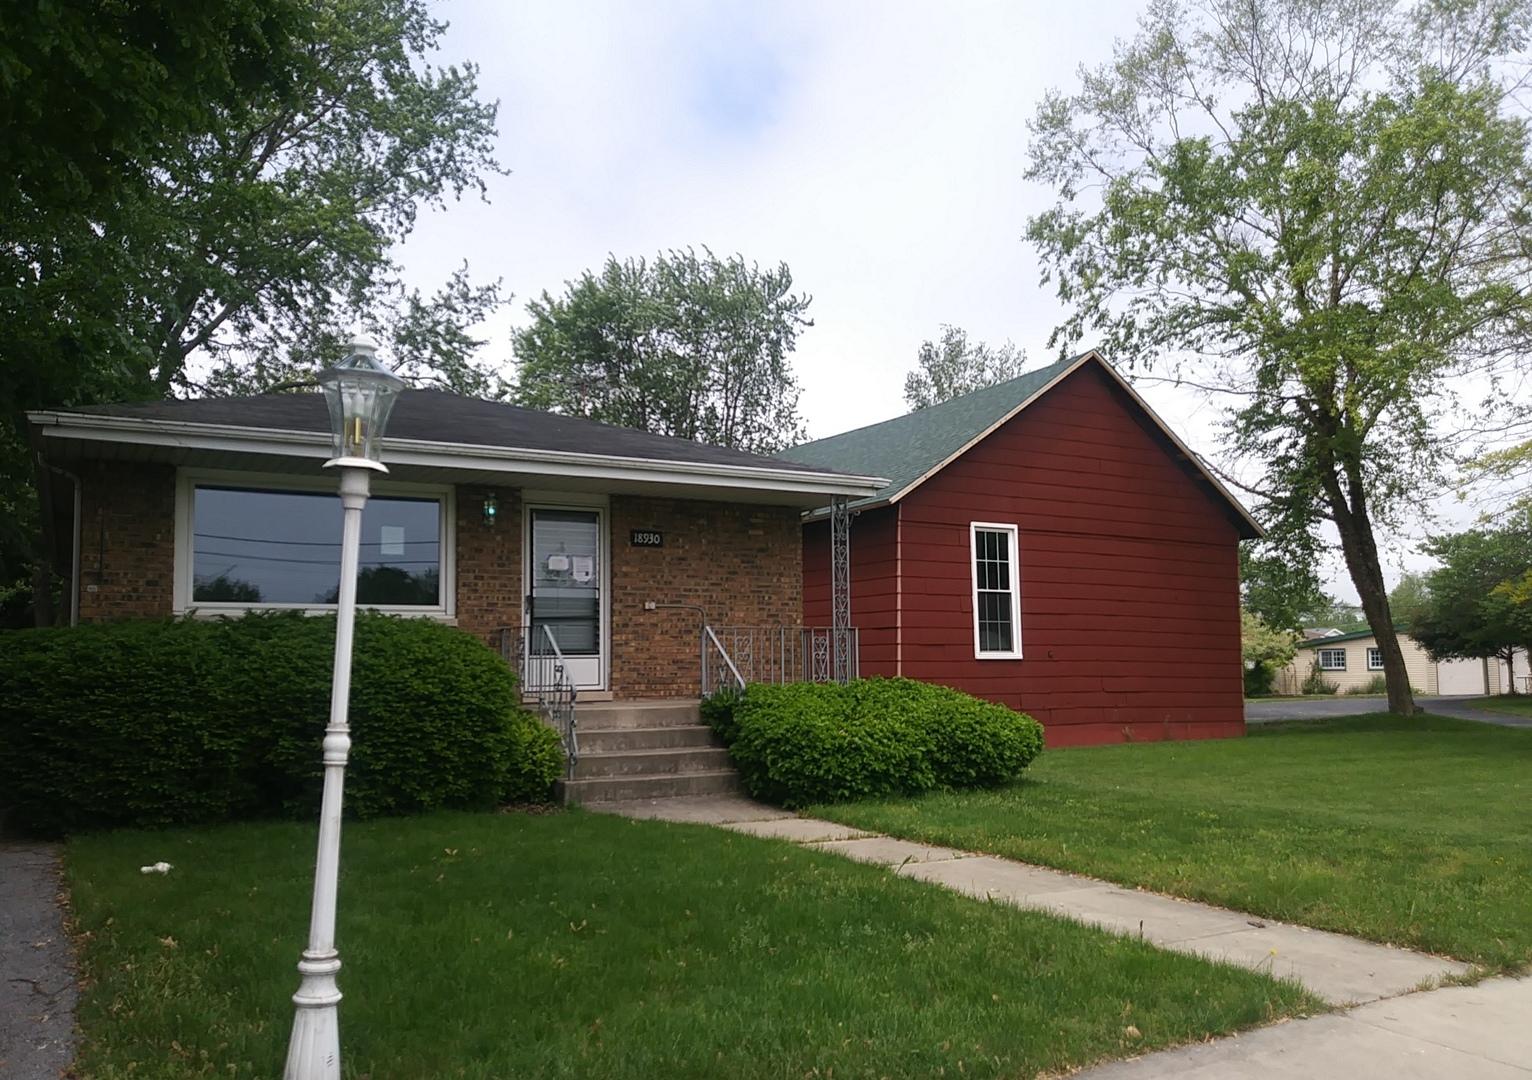 18930 WENTWORTH AVENUE, LANSING, IL 60438